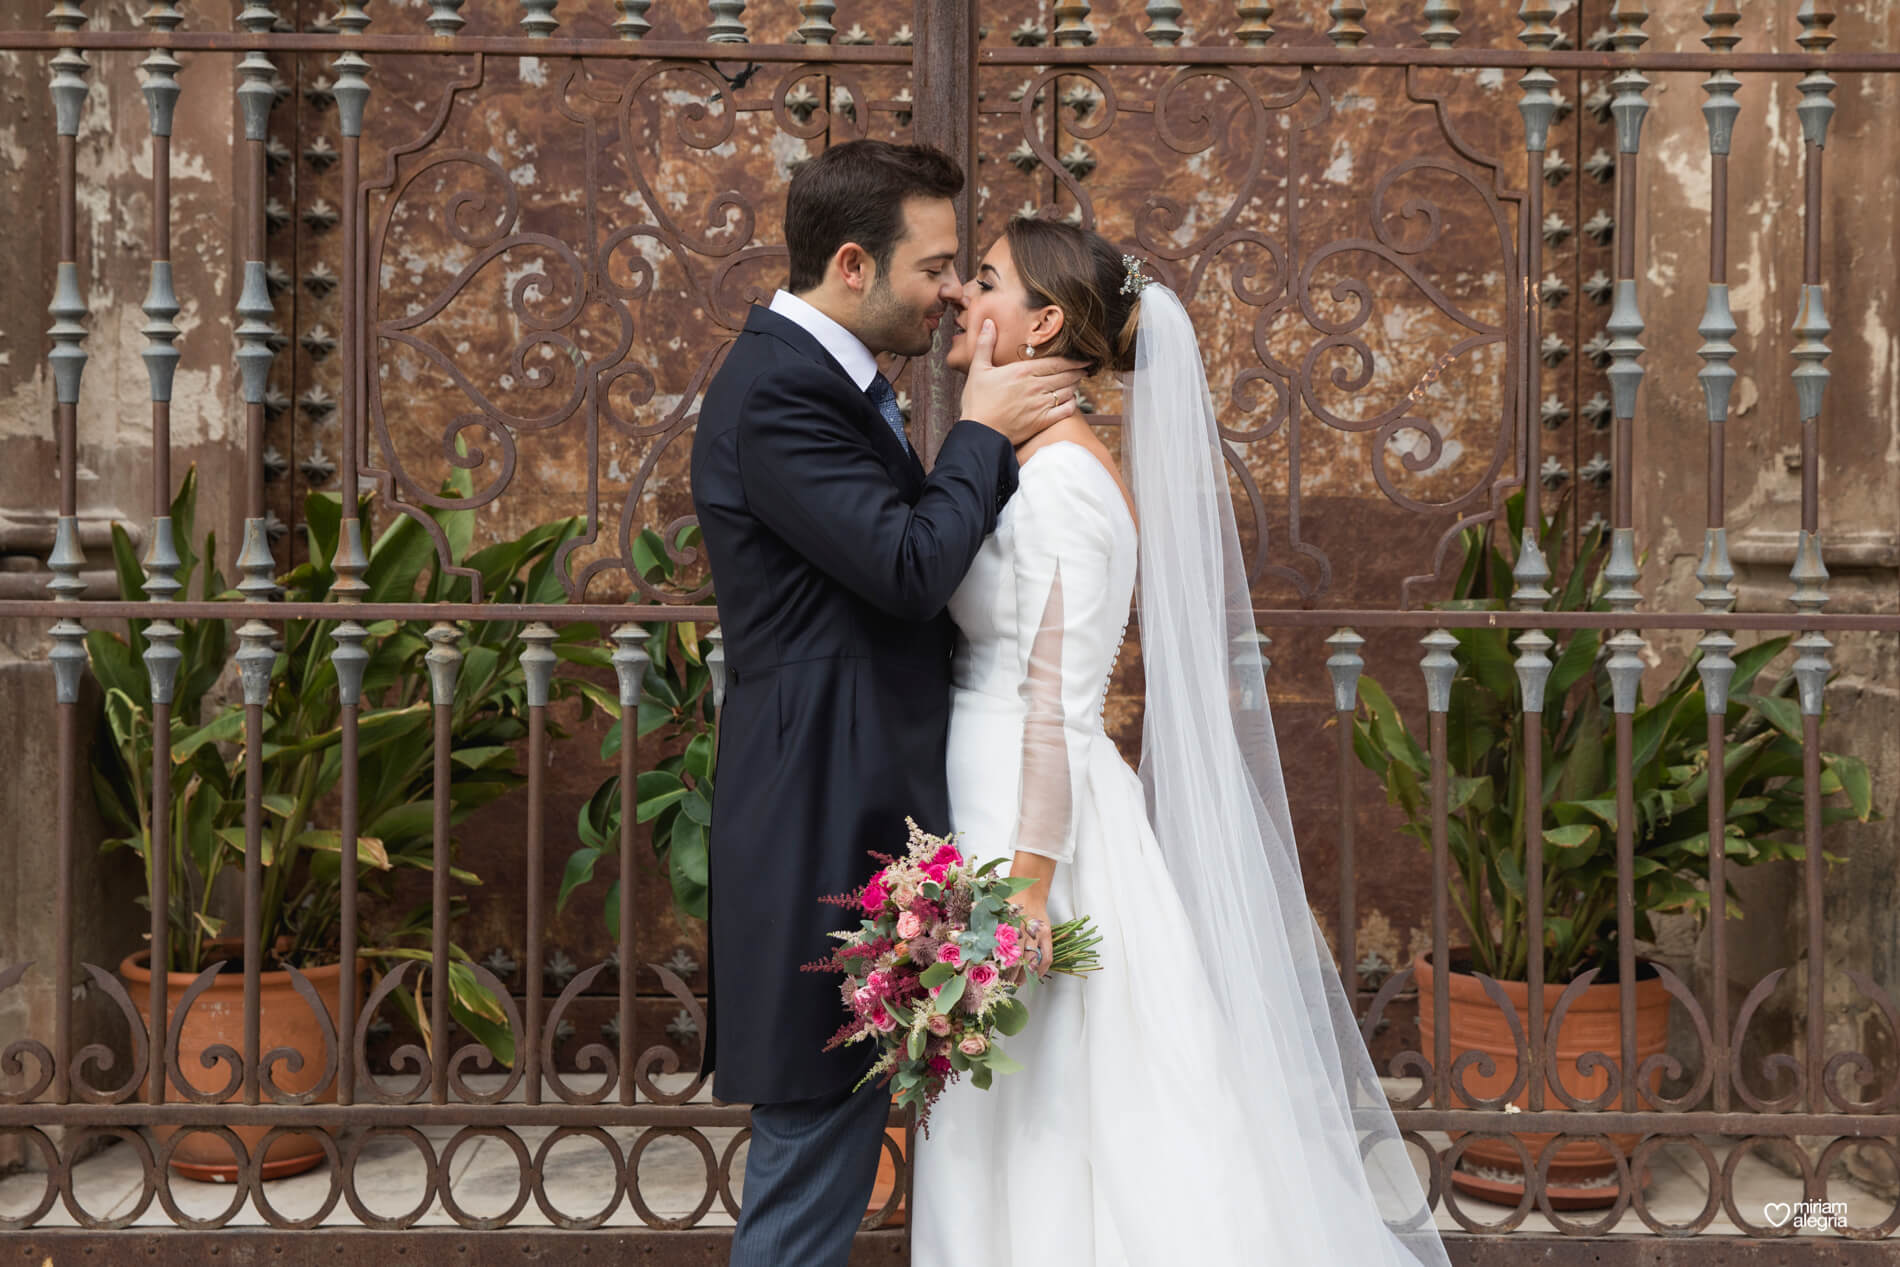 vestido-de-novia-paula-del-vas-miriam-alegria-fotografos-boda-murcia-82